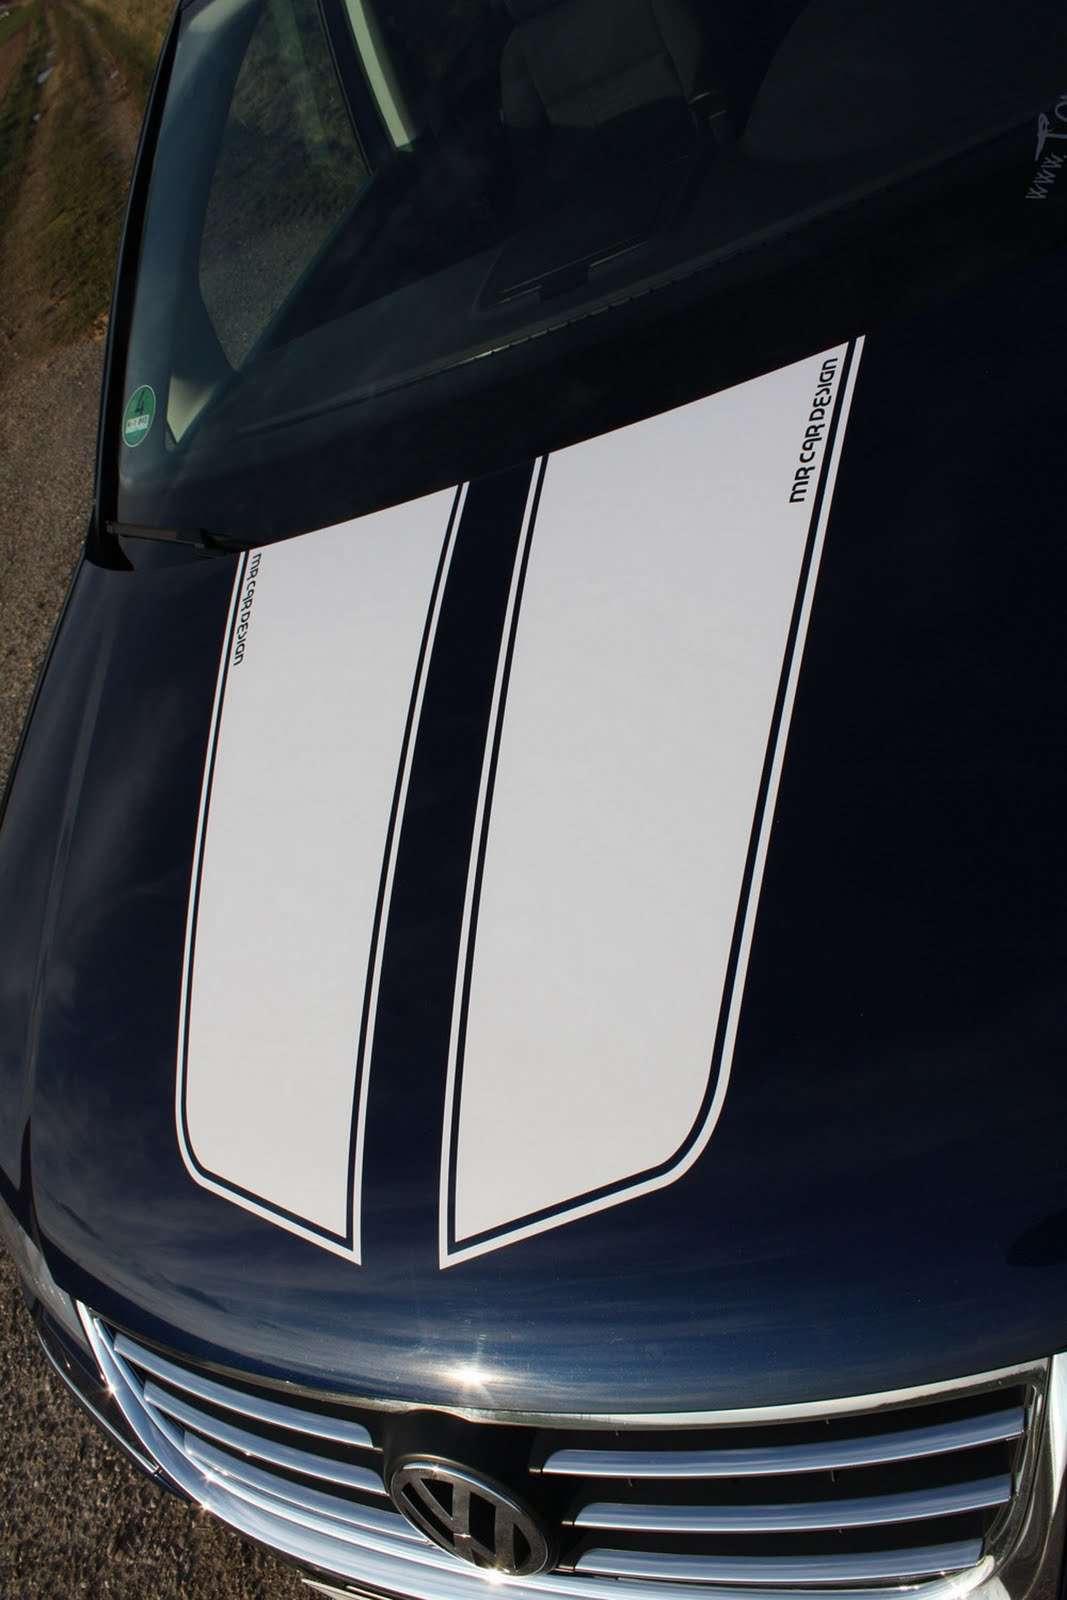 Volkswagen Touran MR Car Design 2010